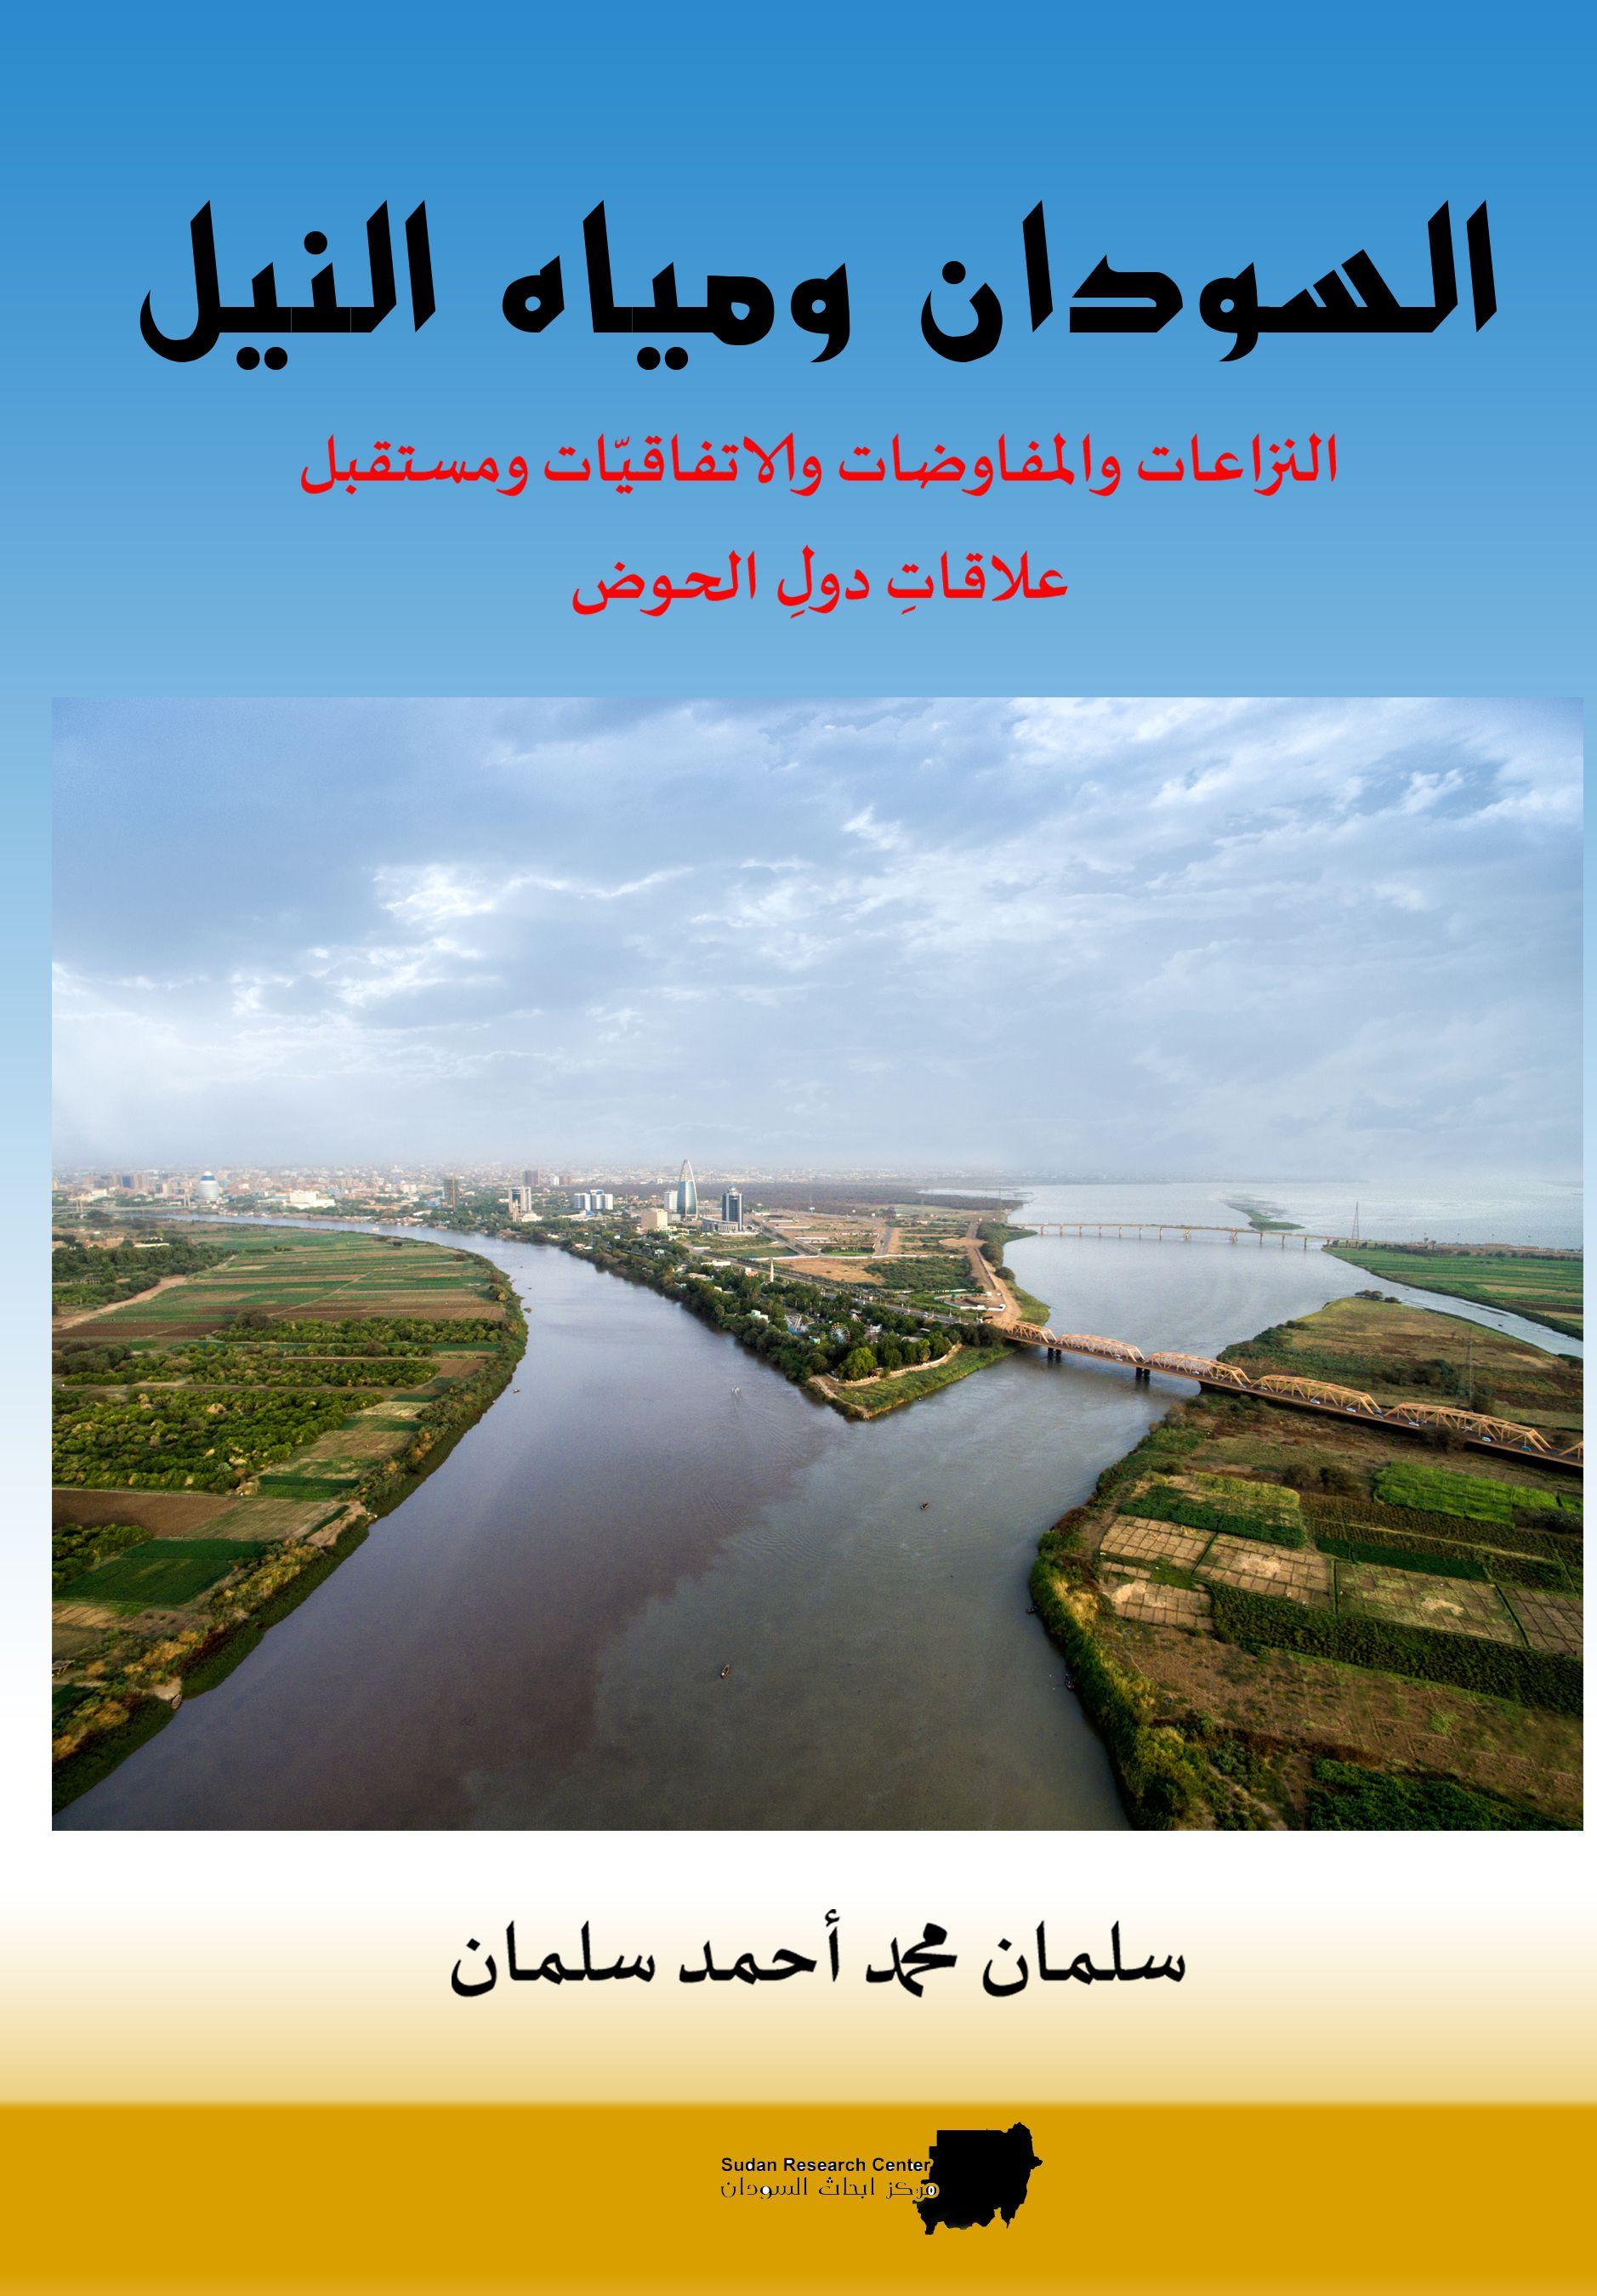 صدور كتاب السودان ومياه النيل للدكتور سلمان محمد أحمد سلمان Country Roads Sudan Country